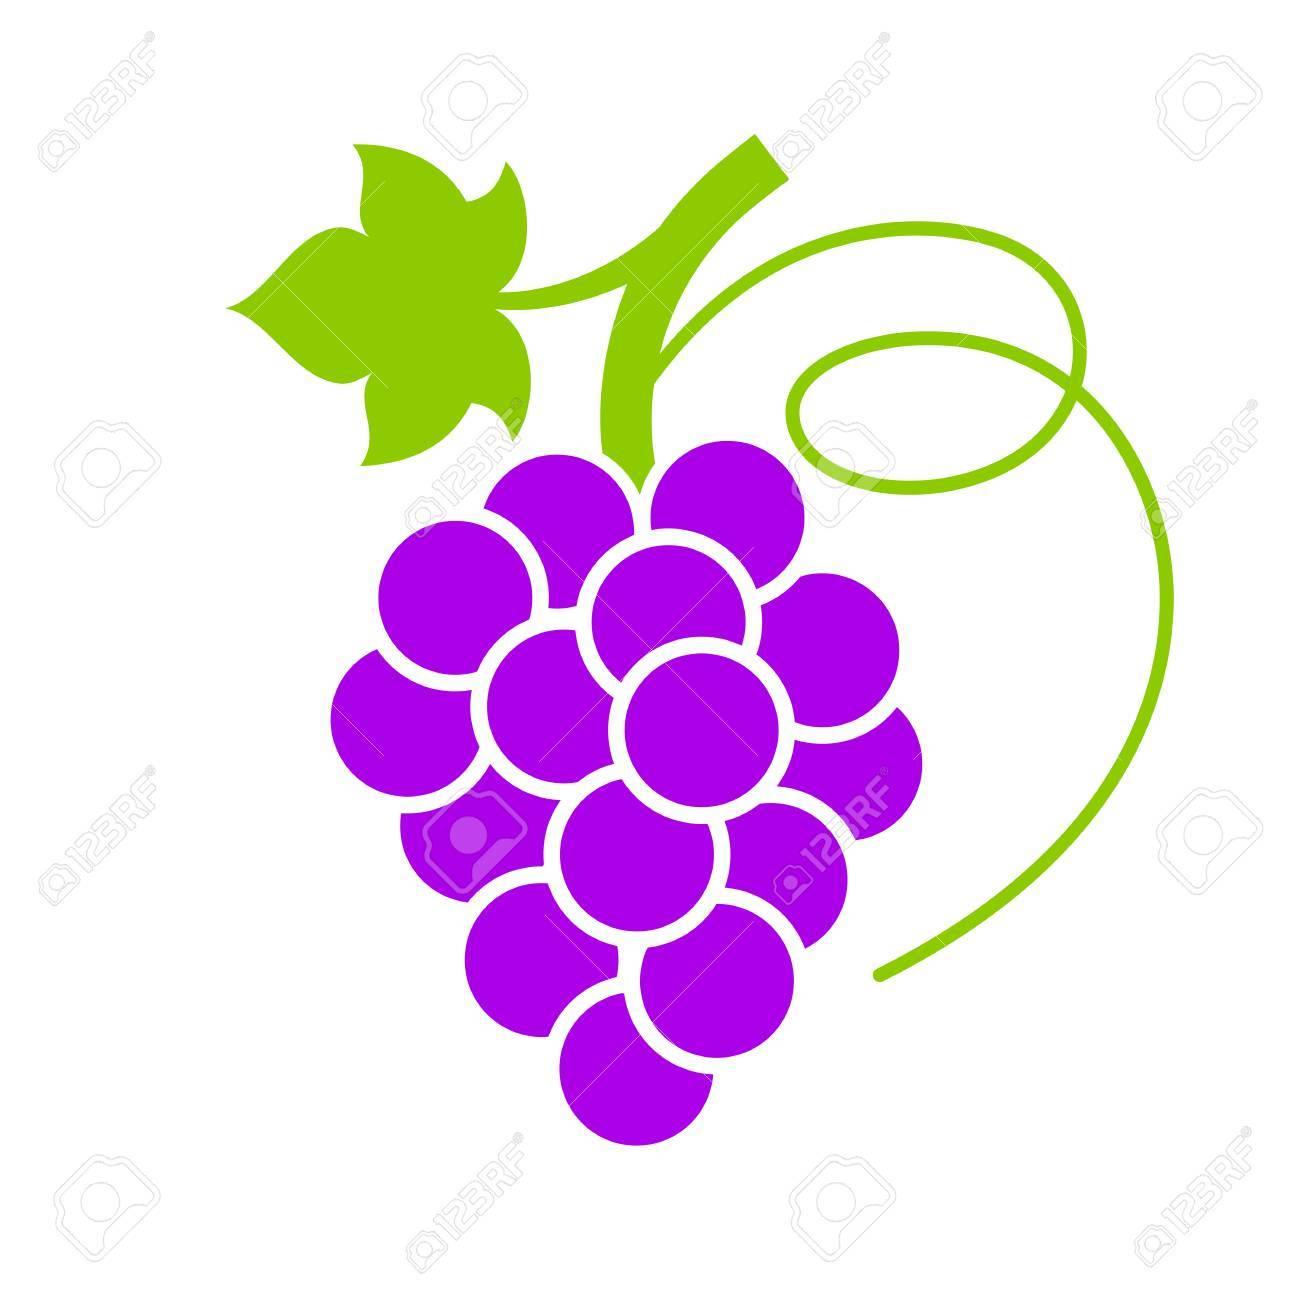 ripe violet grape vector icon royalty free cliparts vectors and rh 123rf com graph vectors desmos grapes vector black and white